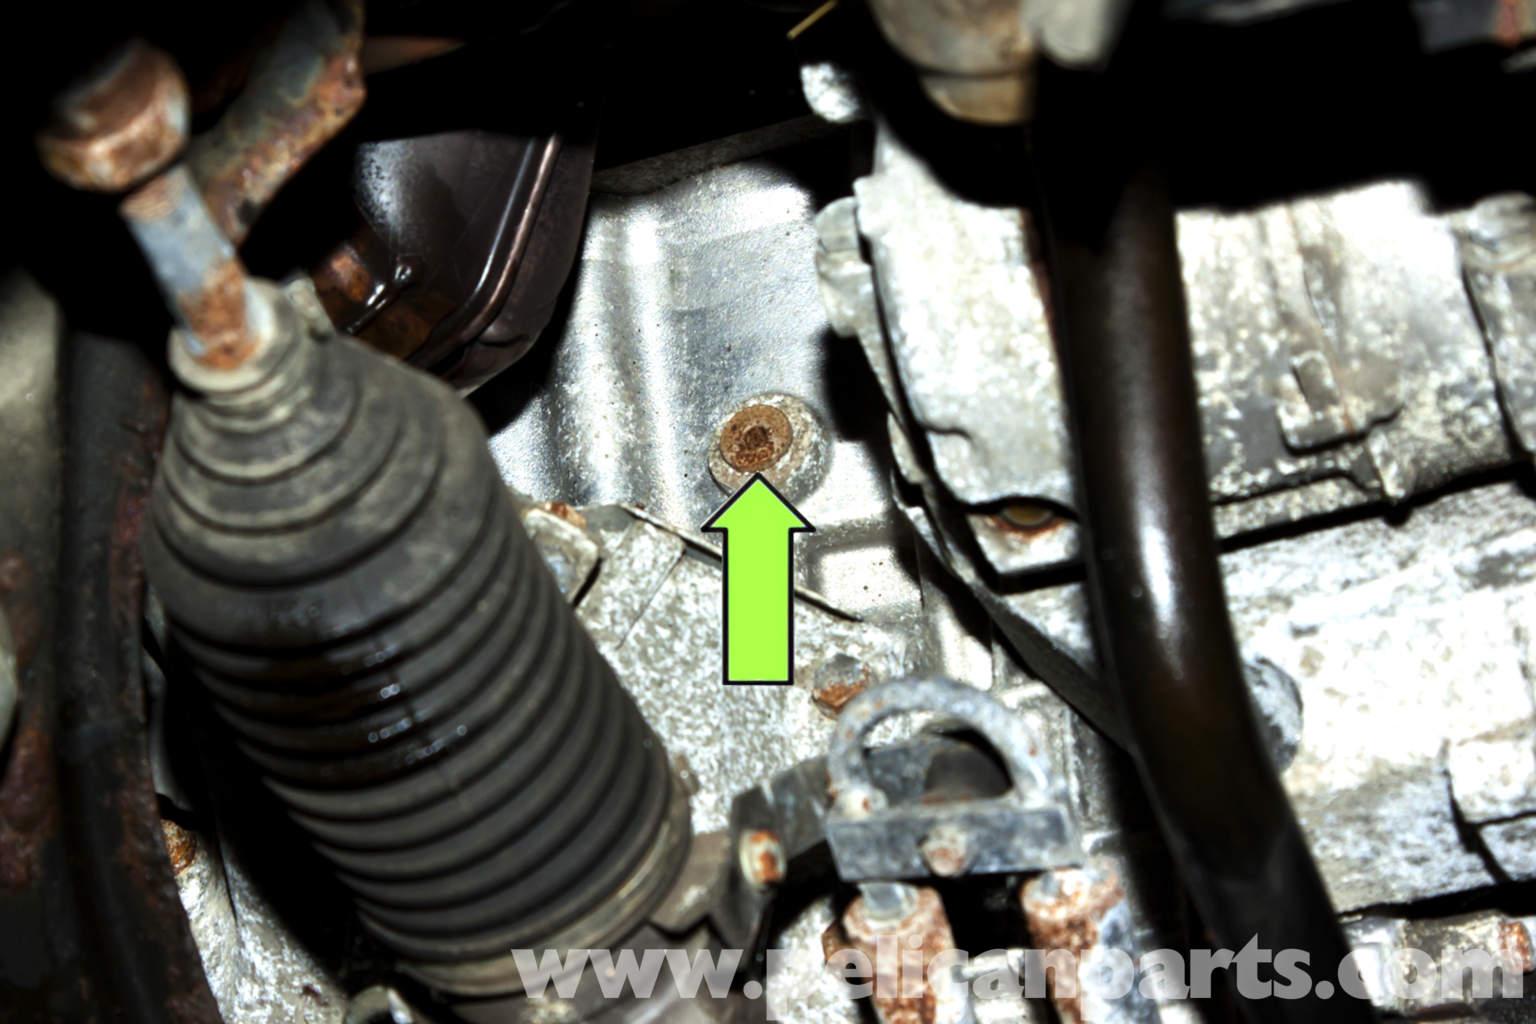 bmw e46 radiator diagram 3 phase wiring homes engine coolant drain plug location get free